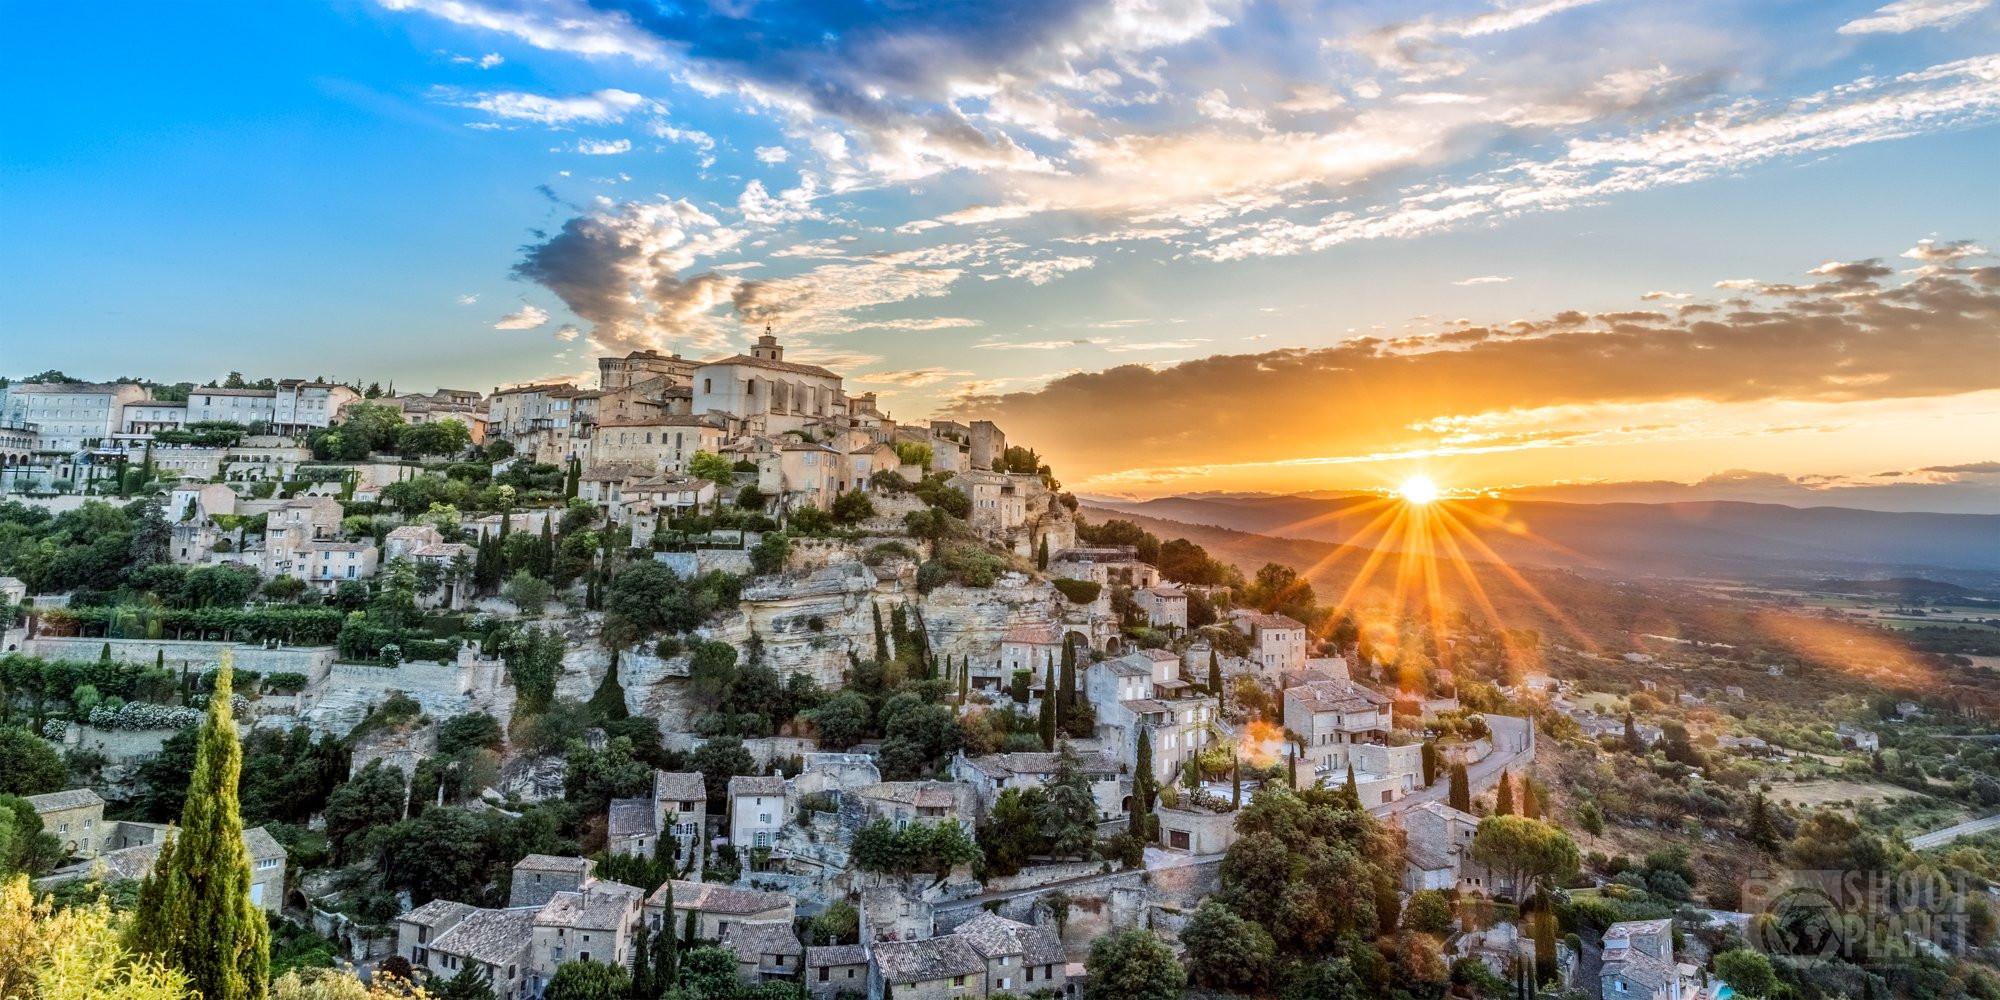 Gordes Provençal village sunrise, Vaucluse, France